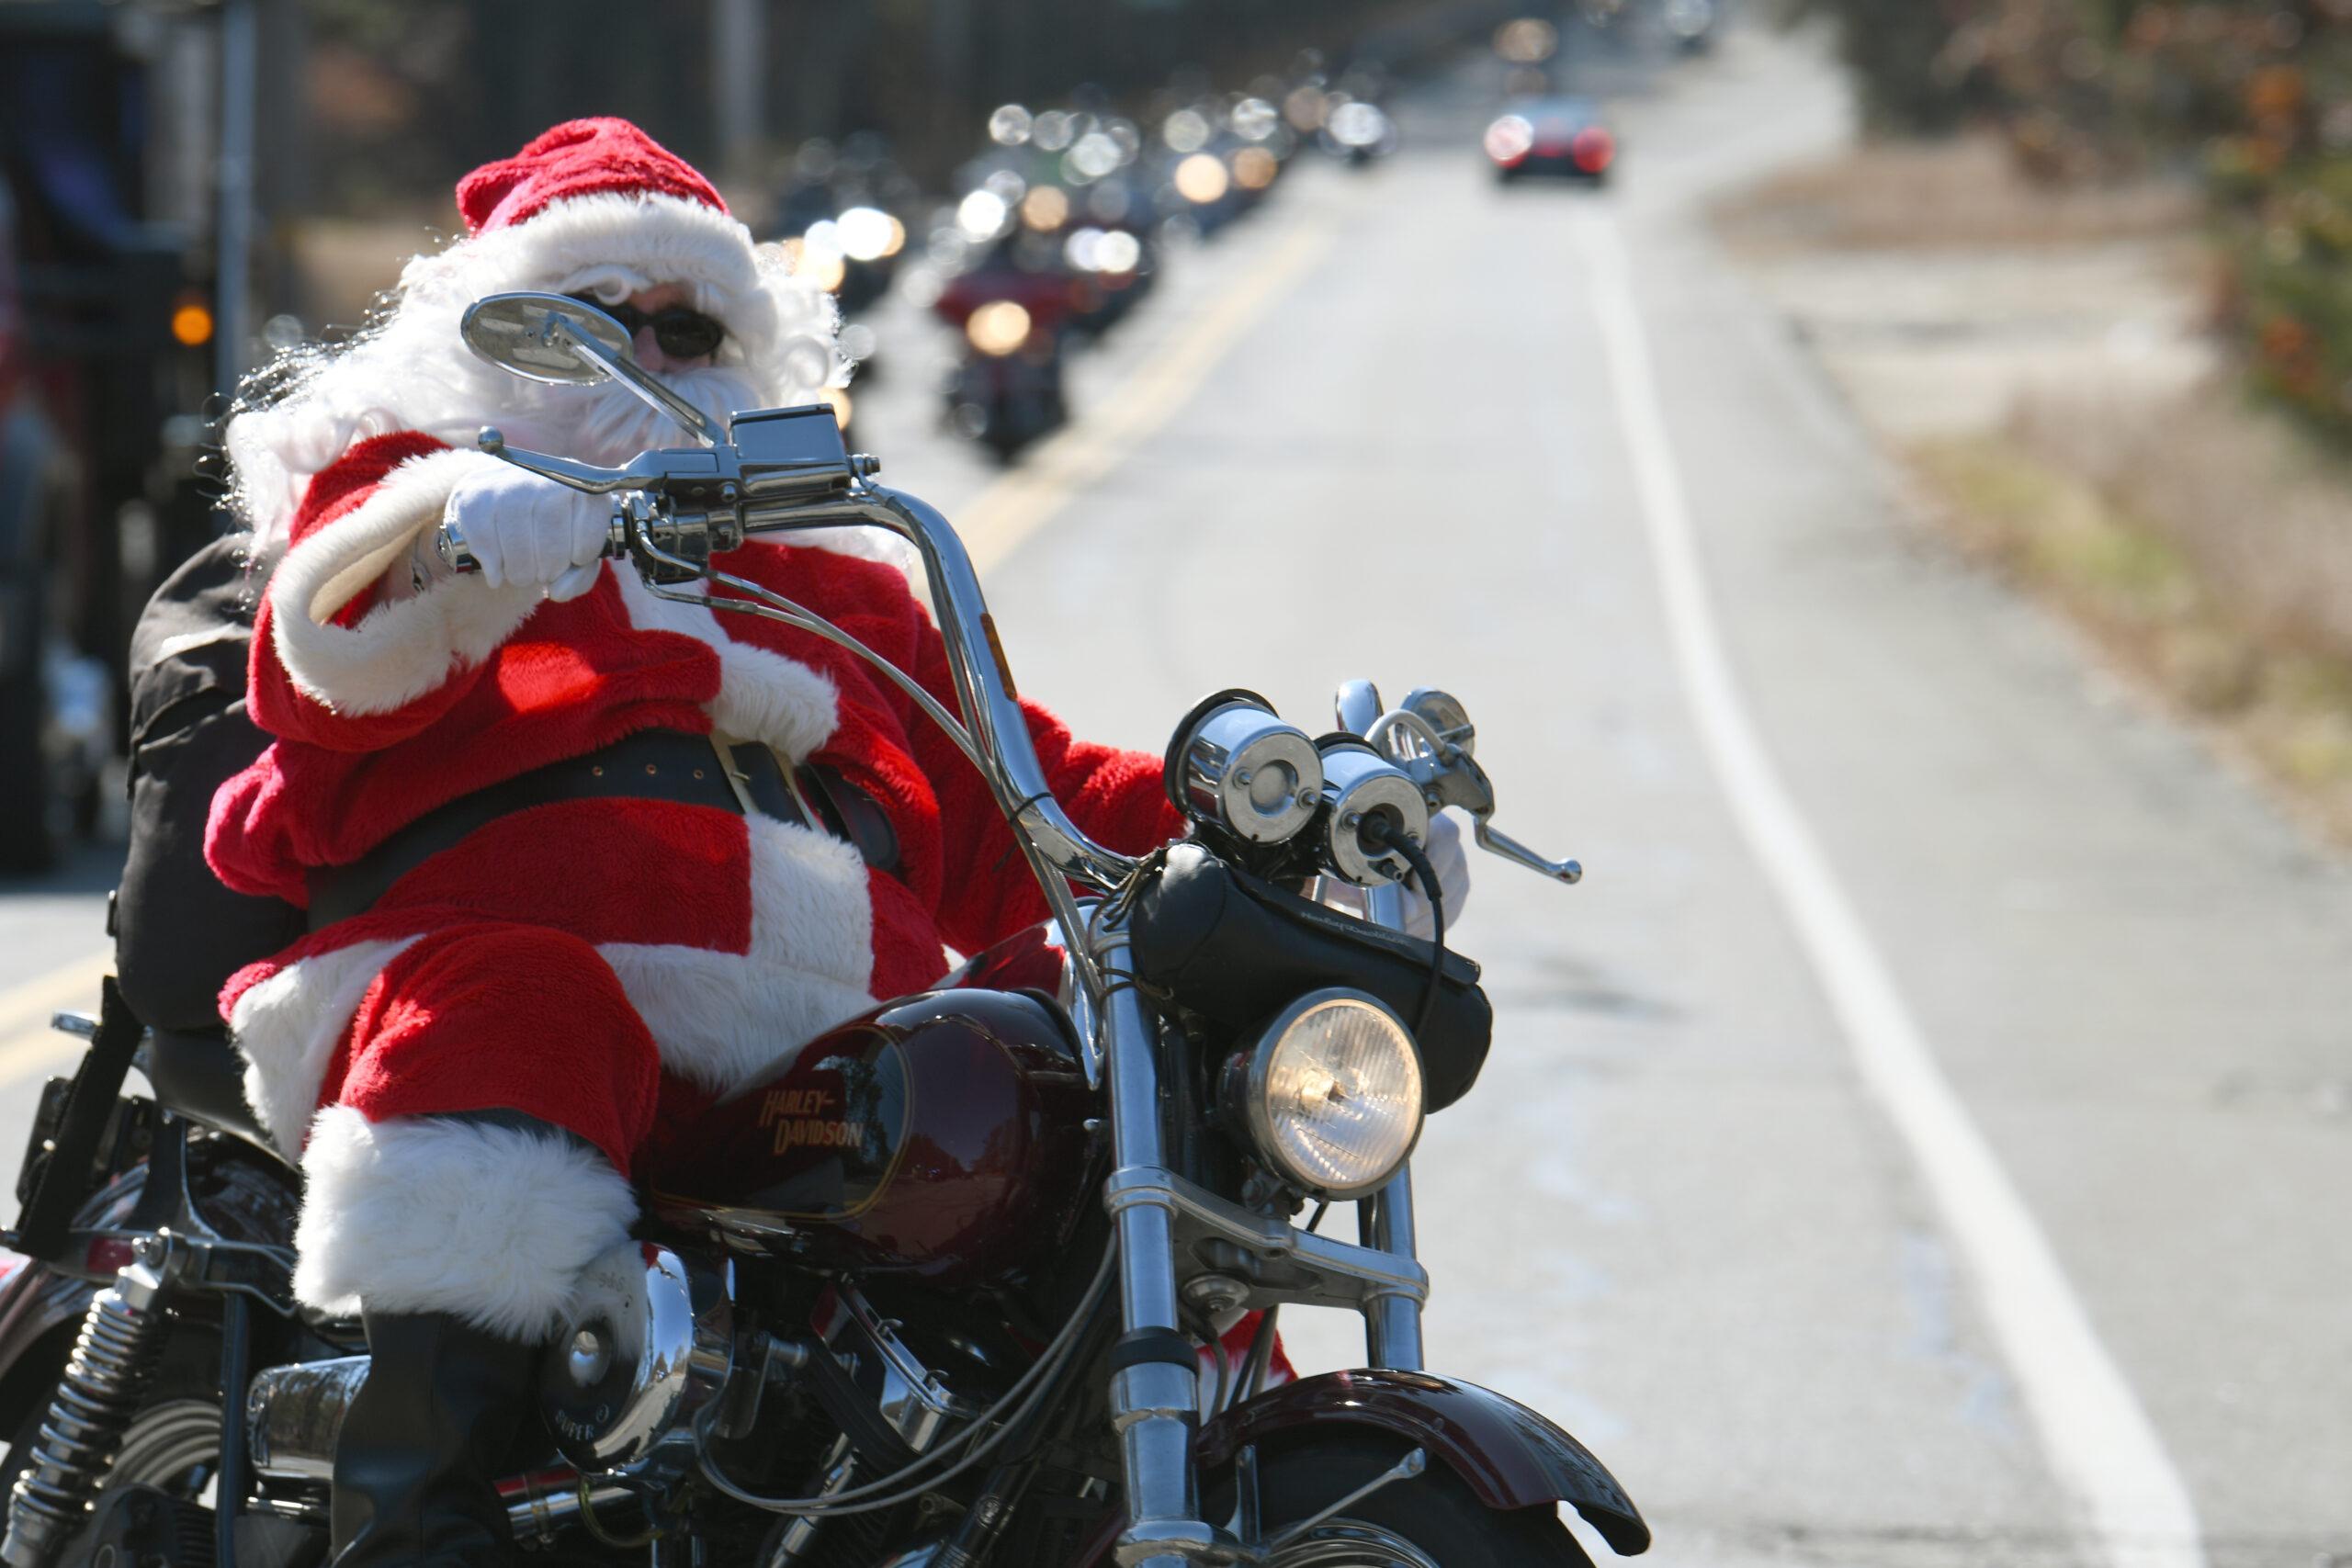 Santa leading the 20th Annual Chris Wetherbee Memorial Toy Run.